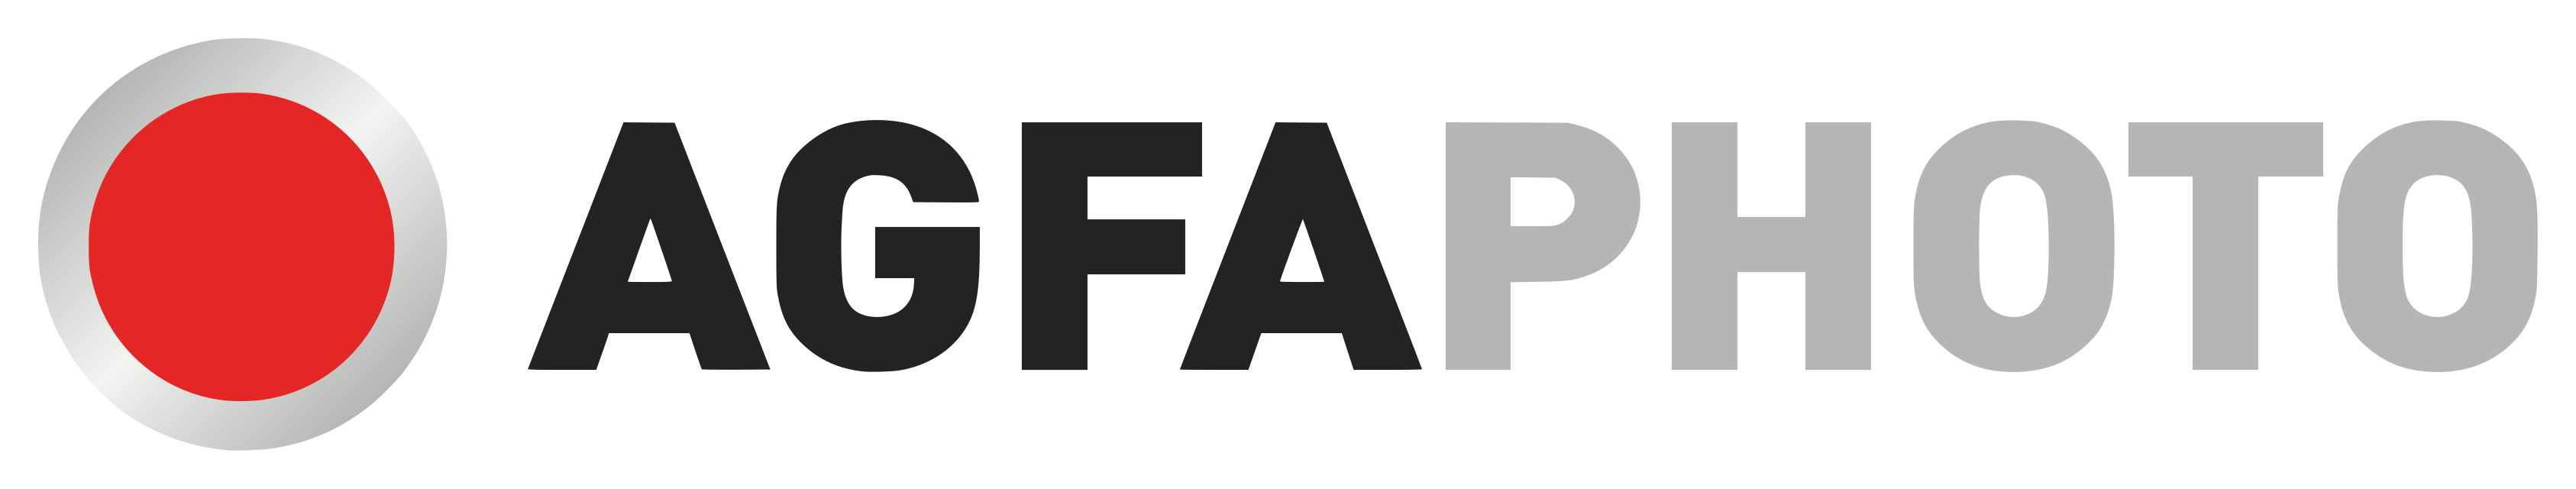 agfaphoto_logo